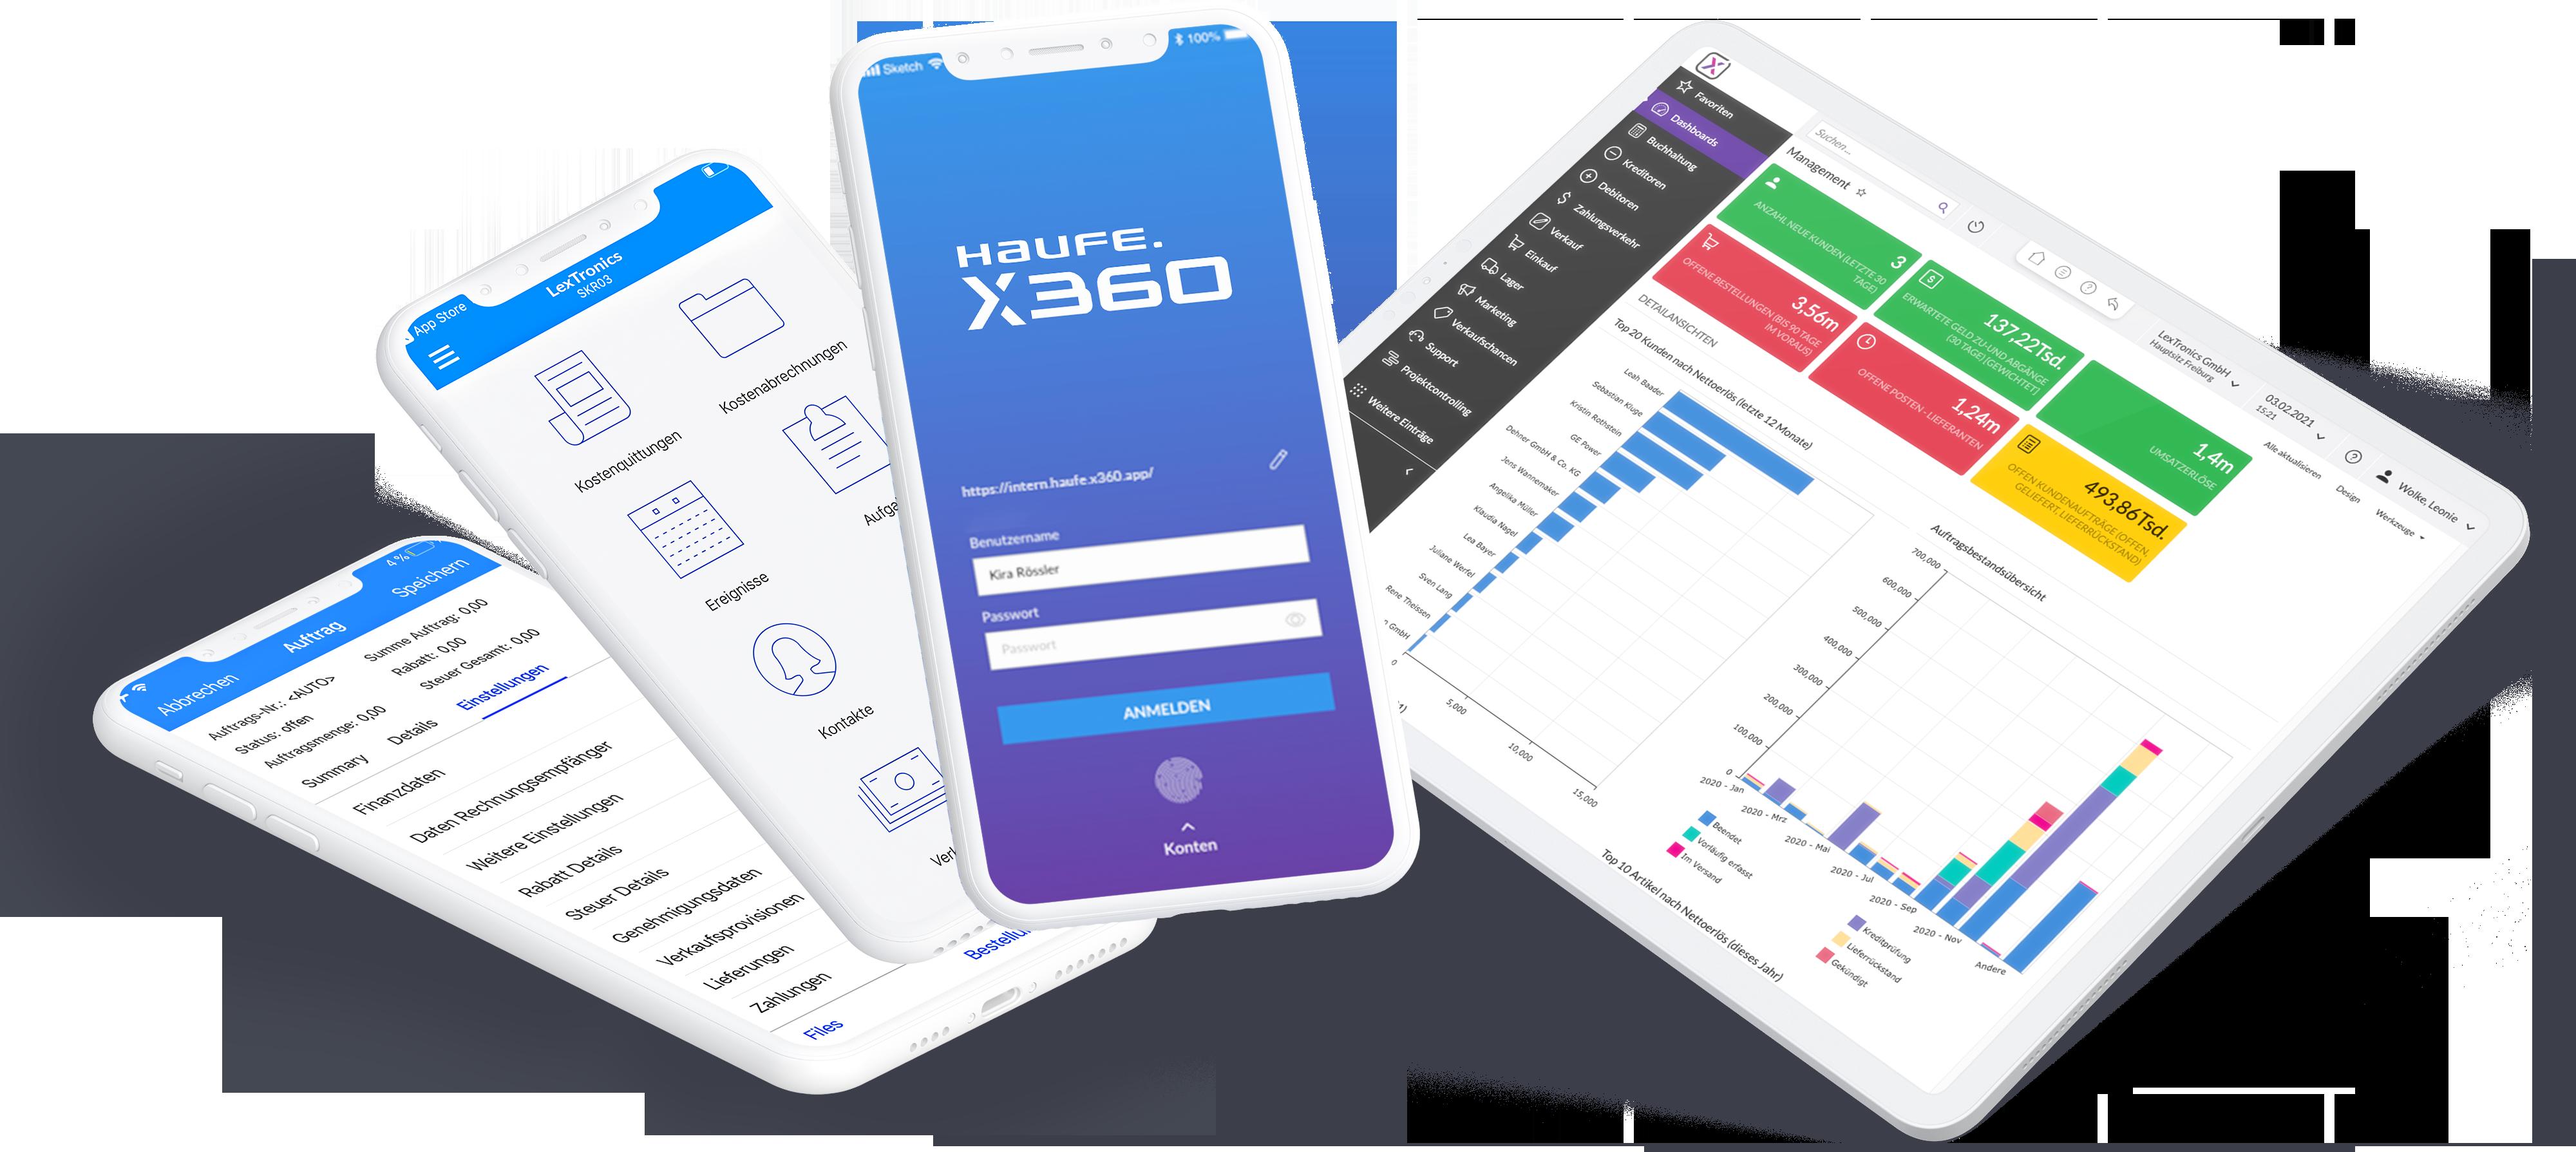 Haufe X360 Warenwirtschaftssystem Bildschirme Mobil